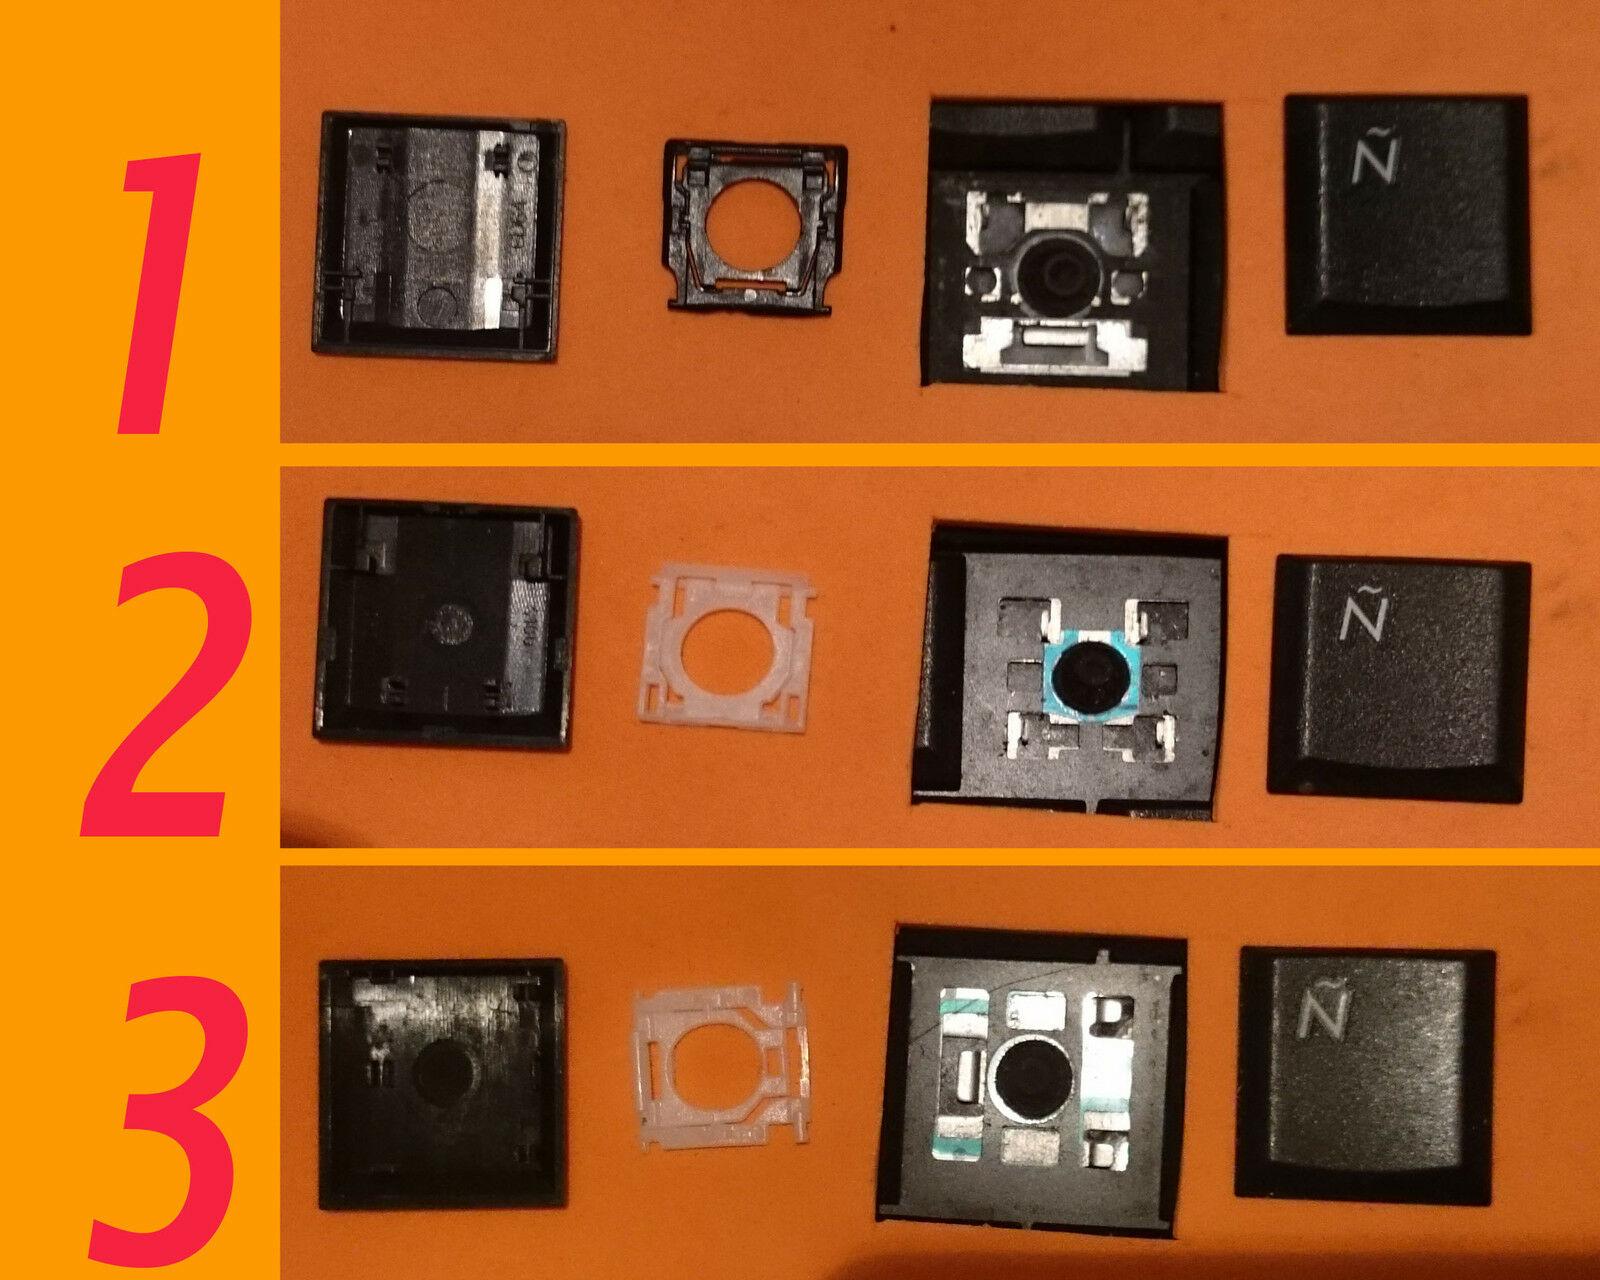 TECLA TECLAS DE TECLADO HP COMPAQ PRESARIO CQ60 CQ61 G61 CQ70 G60 G70